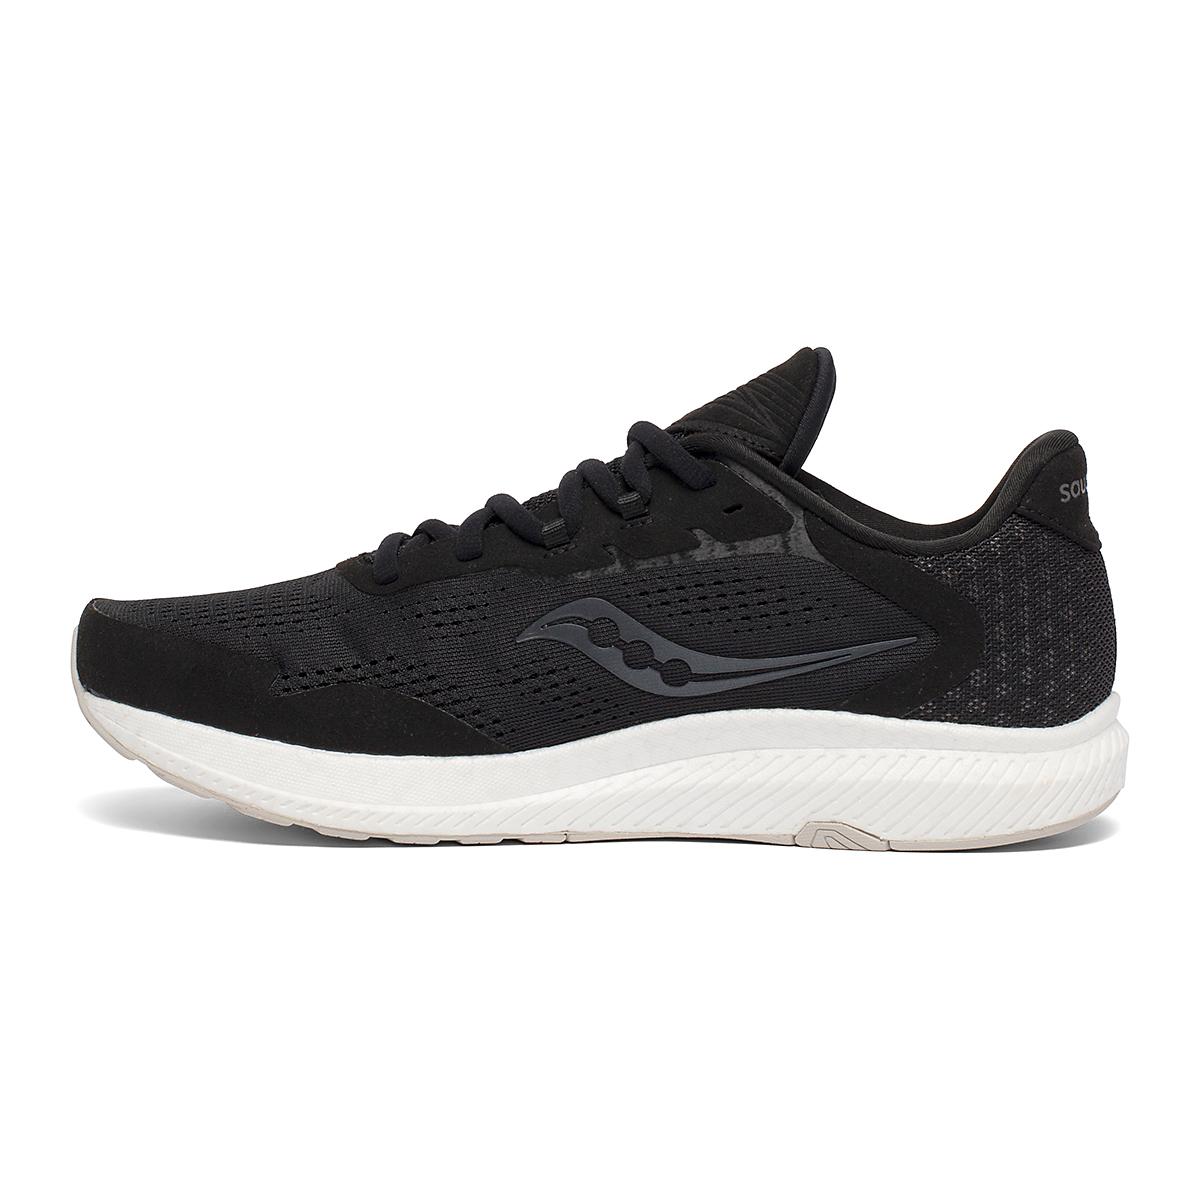 Men's Saucony Freedom 4 Running Shoe - Color: Black/Stone - Size: 7 - Width: Regular, Black/Stone, large, image 2